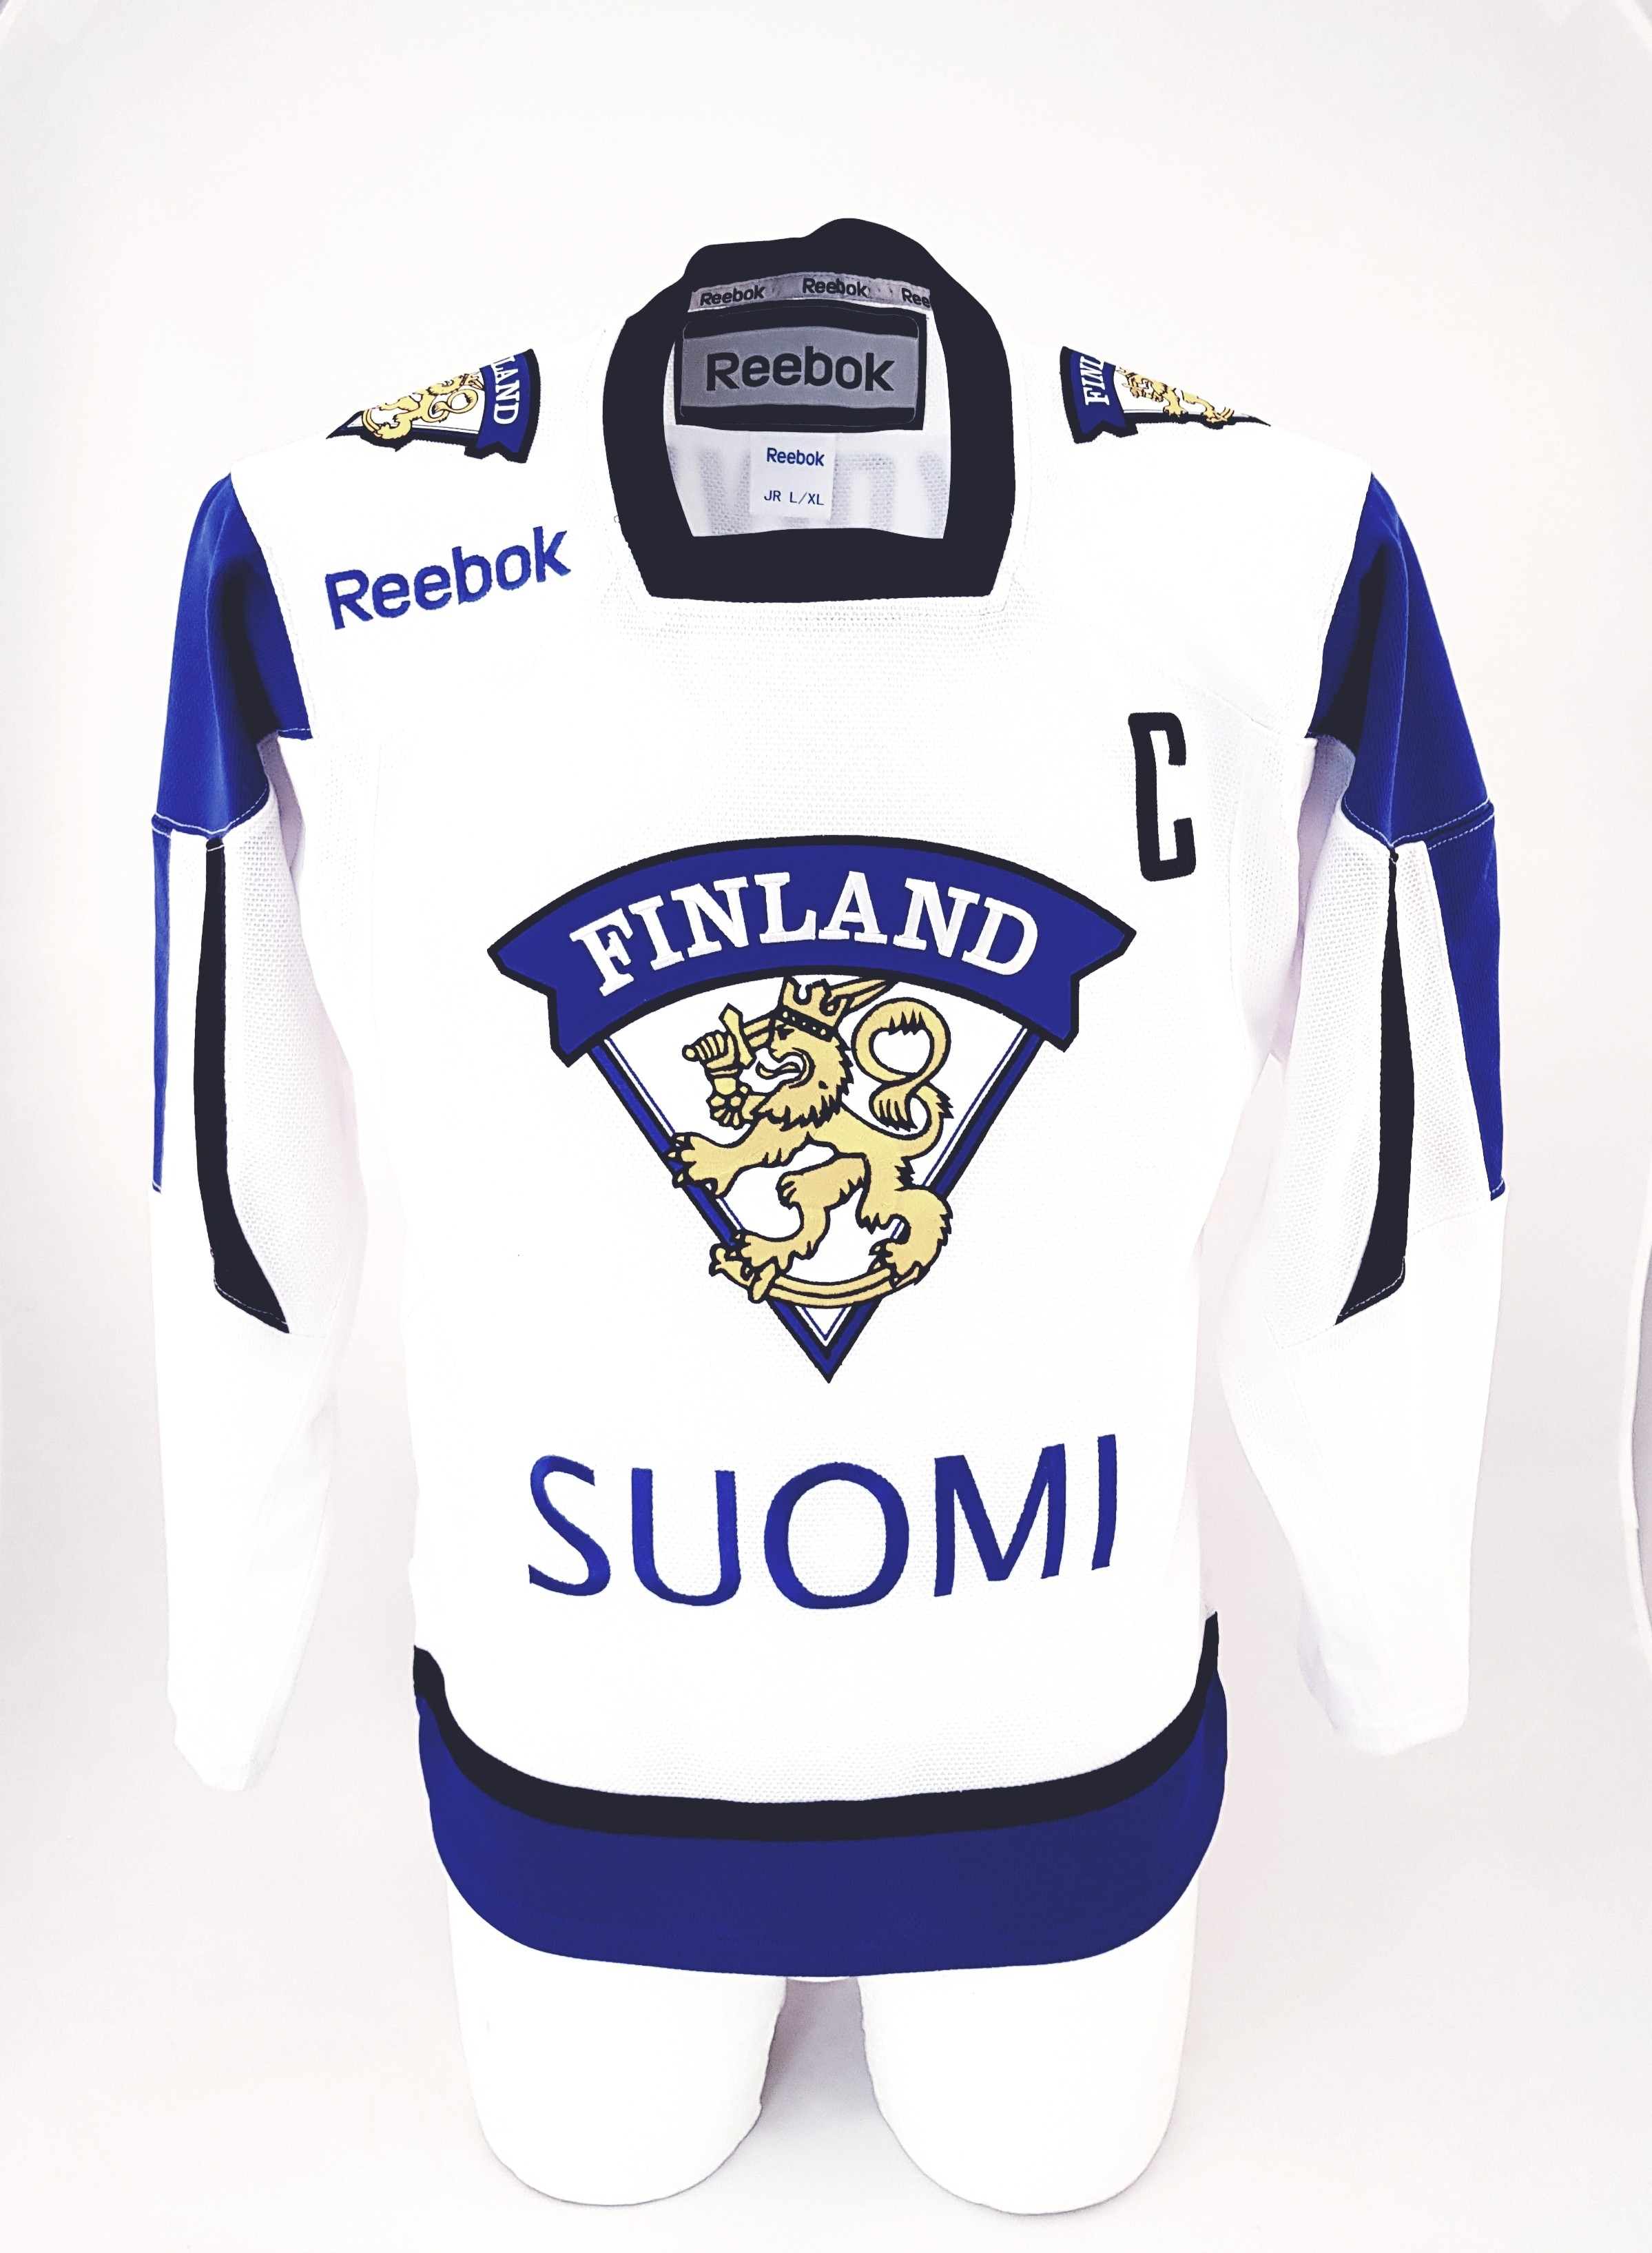 REEBOK Team Finland Bērnu Fanu Krekls (Izbraukuma) - Koivu